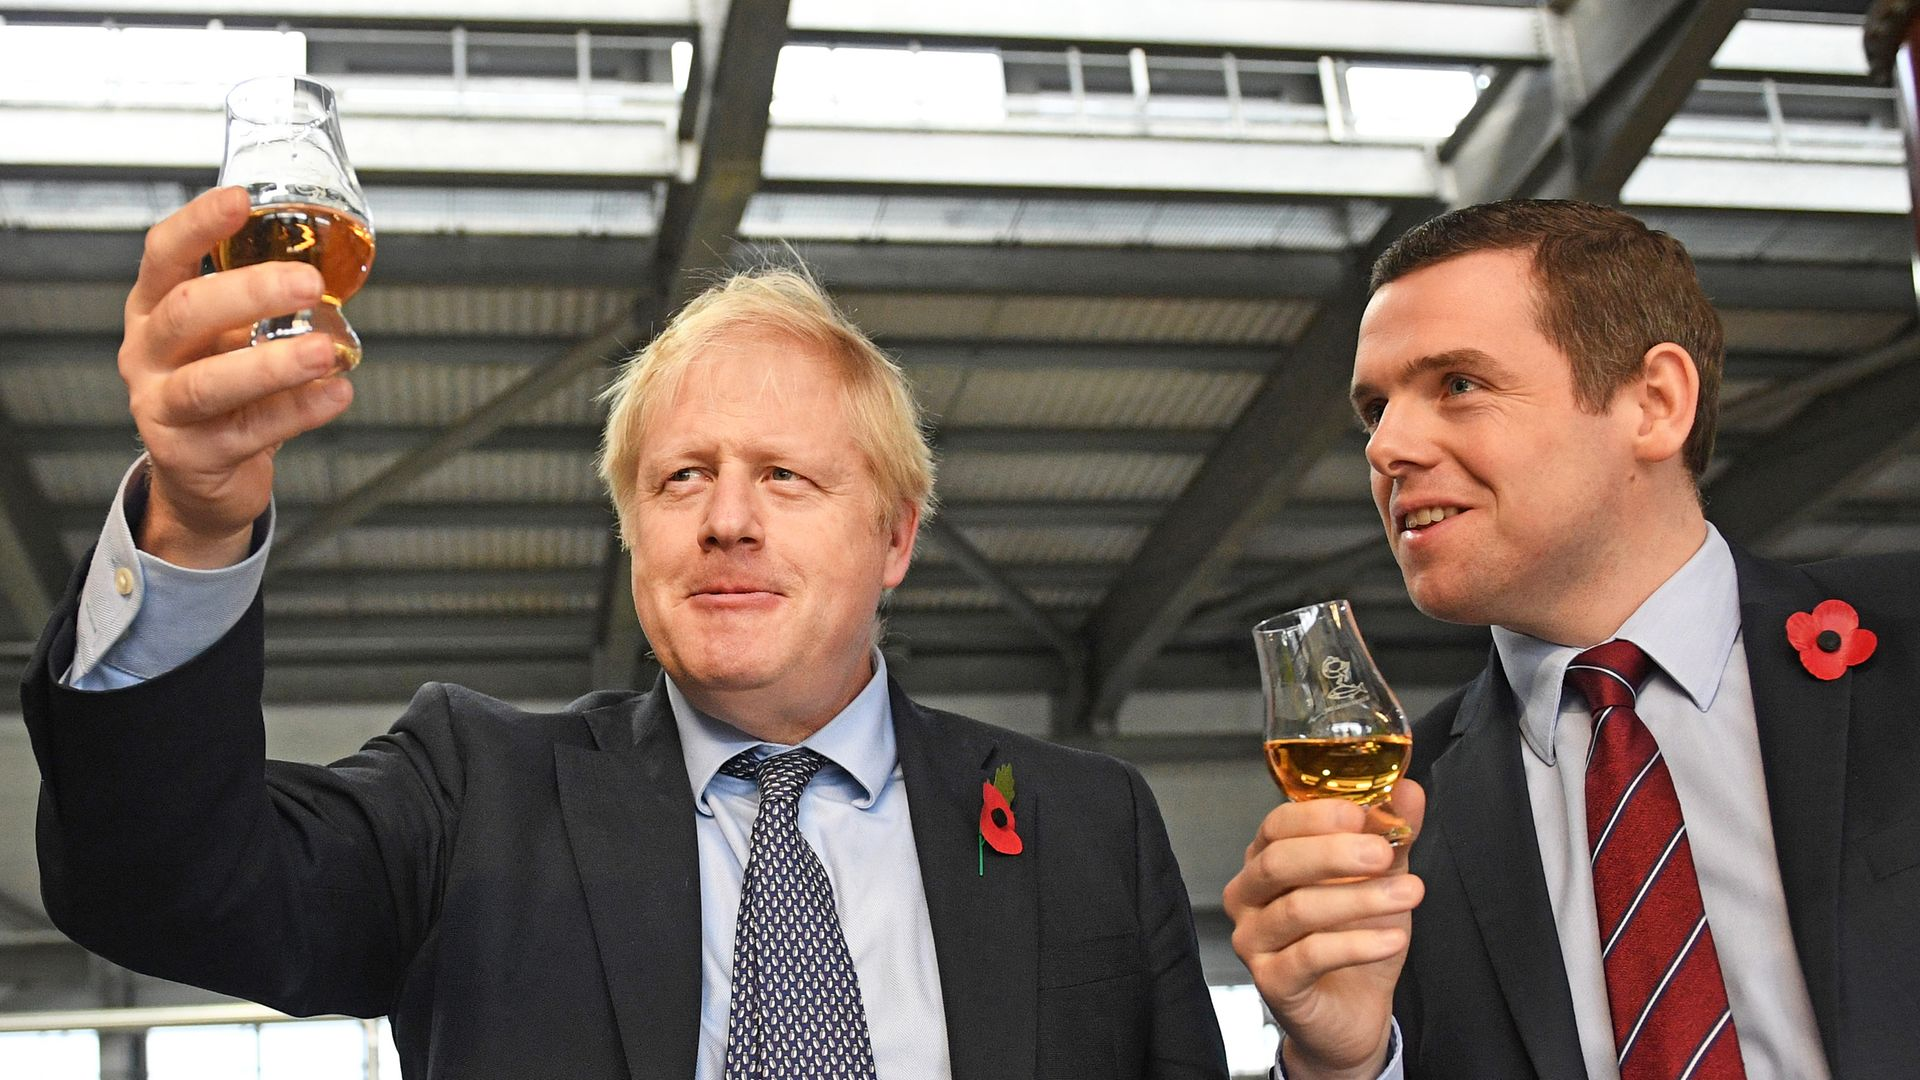 Prime Minister Boris Johnson (left) alongside MP Douglas Ross - Credit: PA